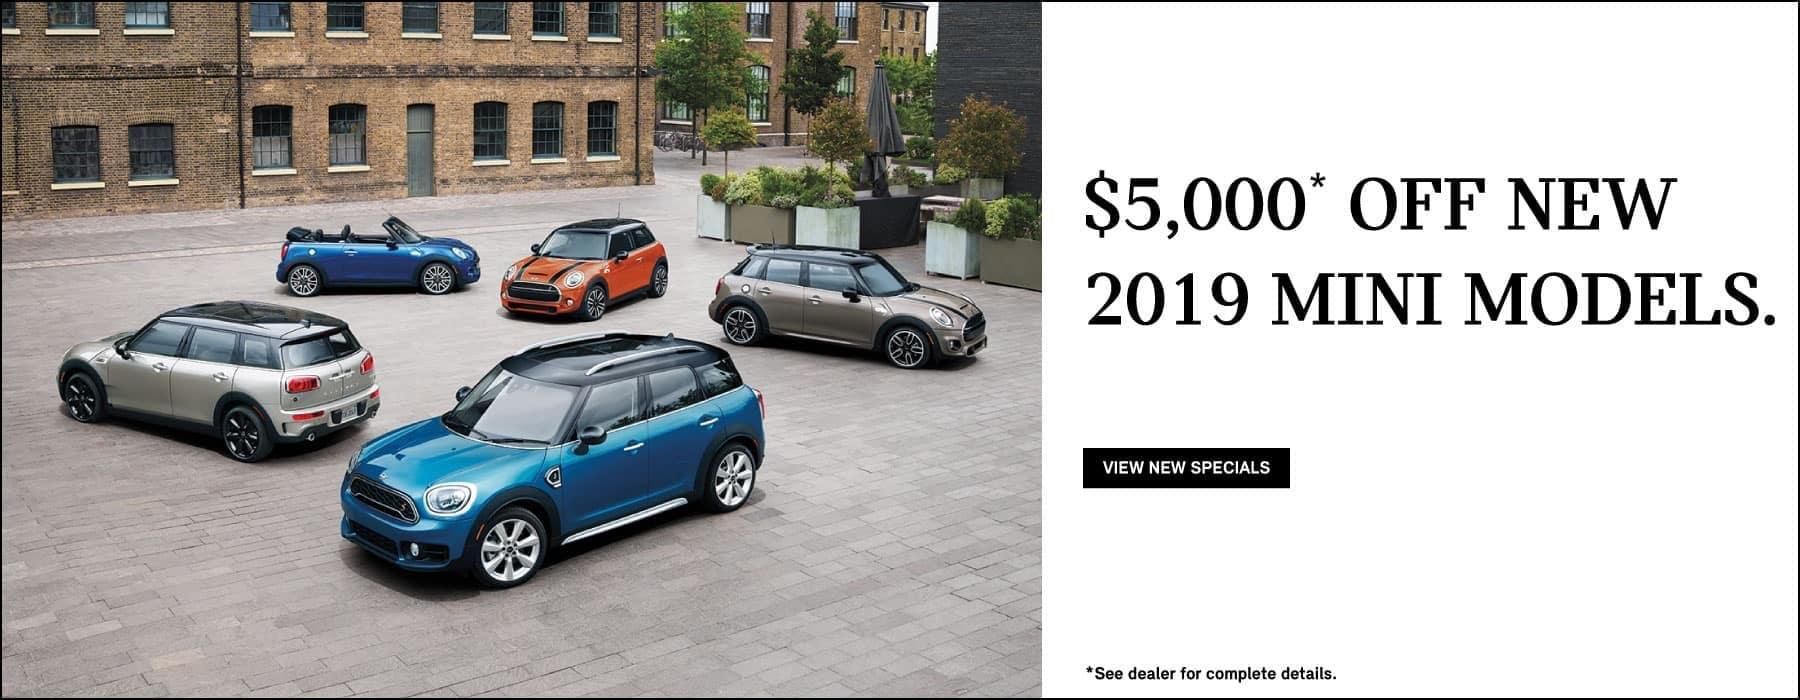 MINI Family 2019 Models.  $5,000 Off New 2019 MINI Models.  See dealer for complete details.